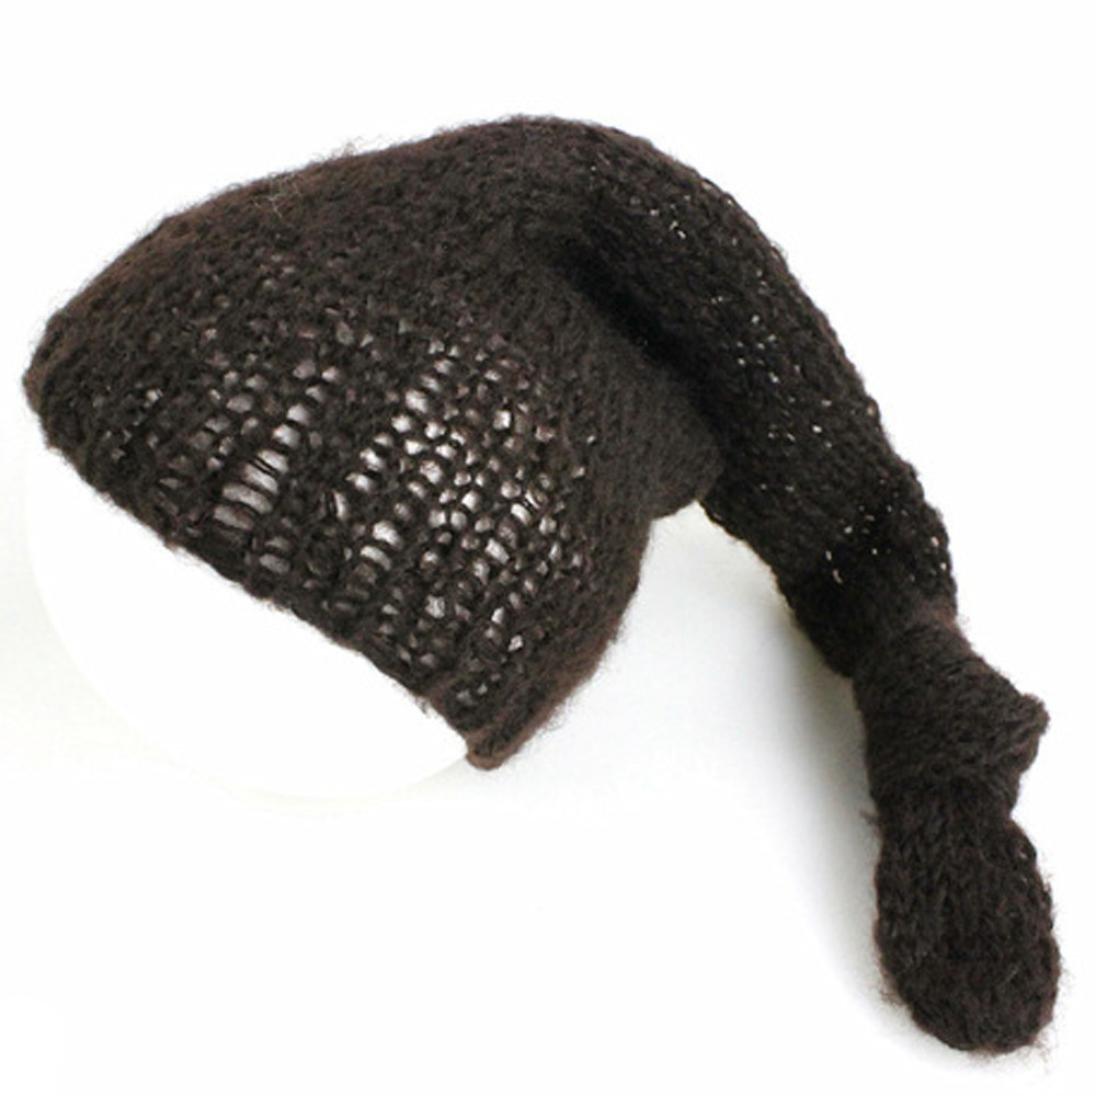 Newborn Photography Hand Knit Posing Props Baby Hats HUHU833 Baby Hats Black